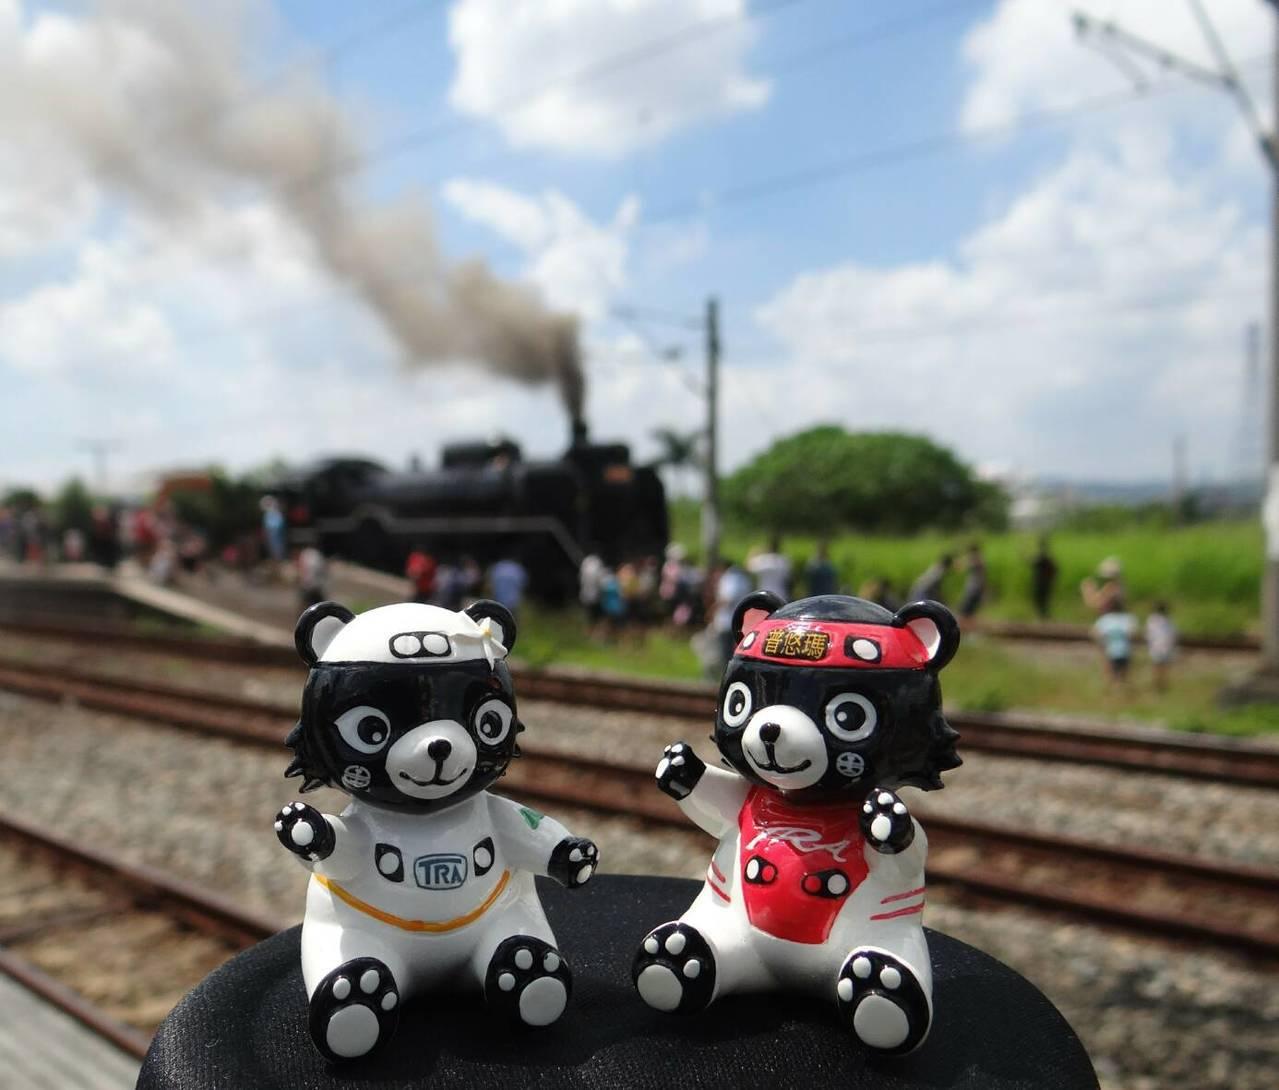 DT668蒸汽火車本月11日在西部幹線亮相,鐵道迷爭拍。照片提供/台鐵局